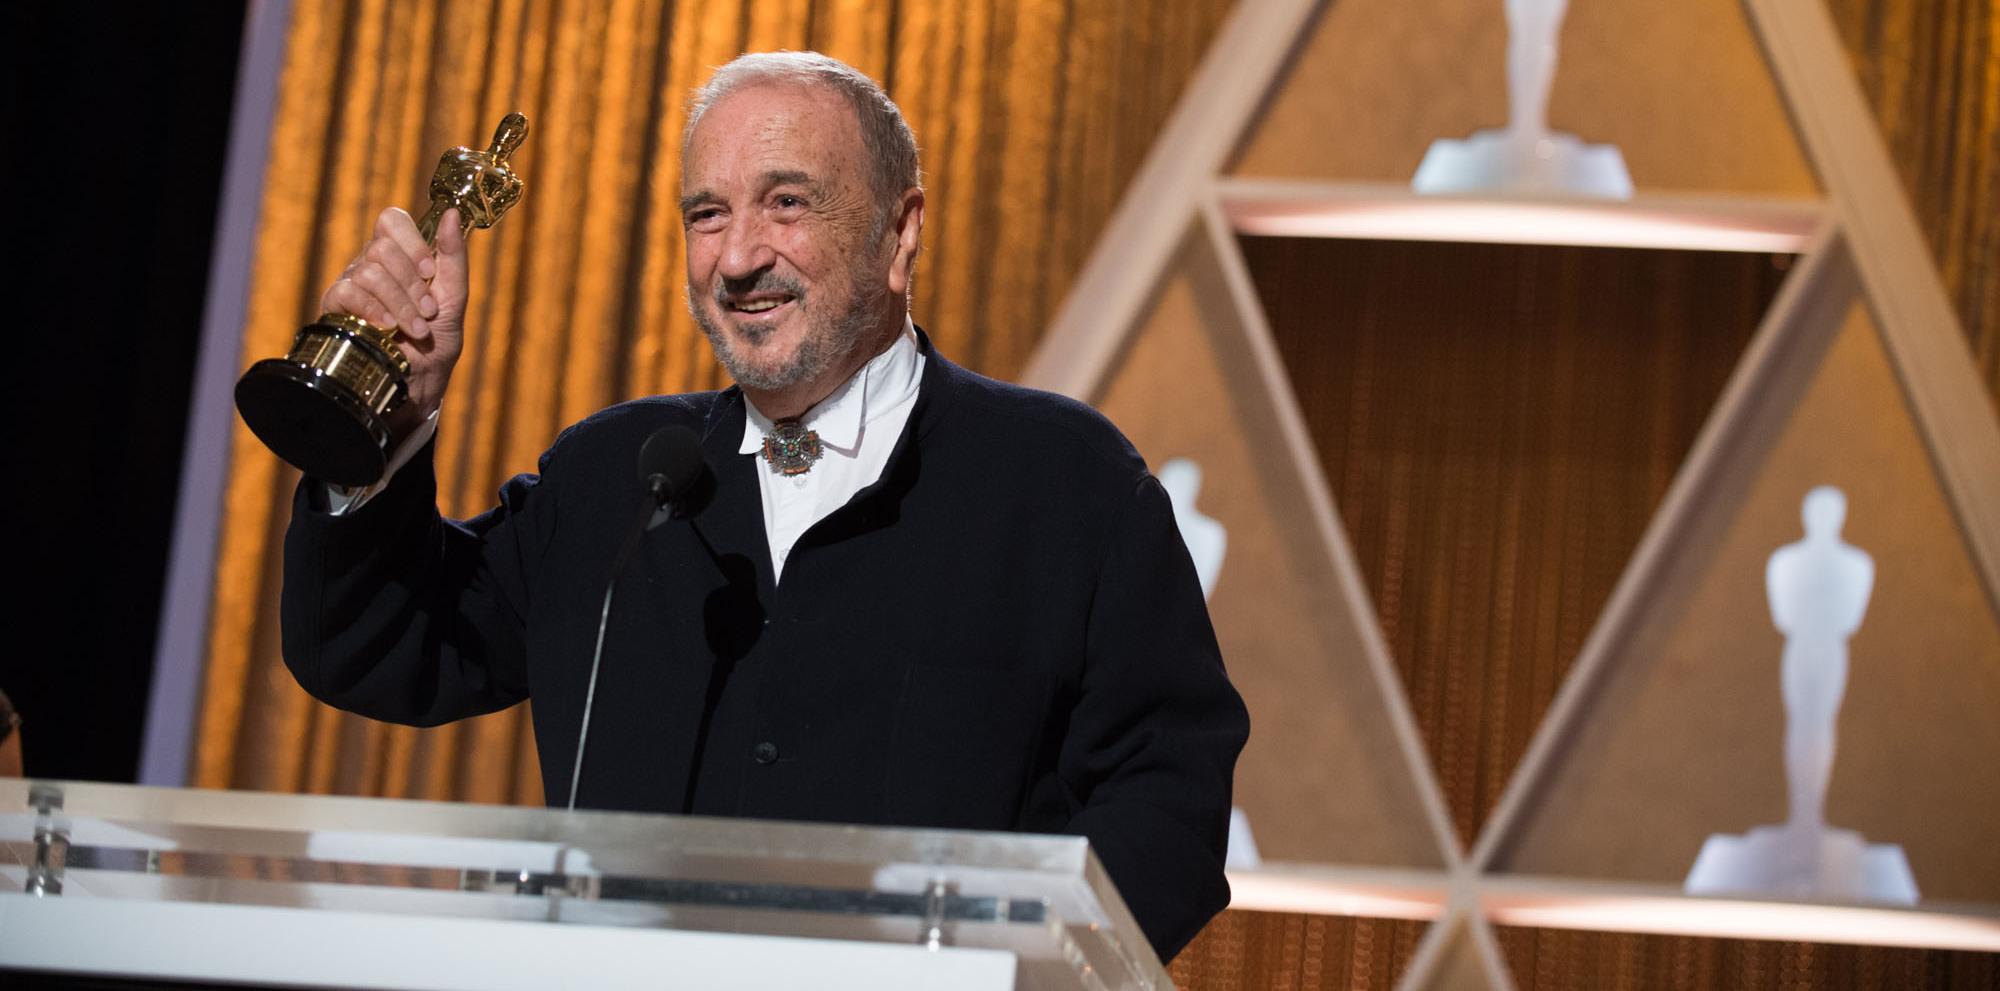 Jean-Claude Carrière recebe Oscar Honorário